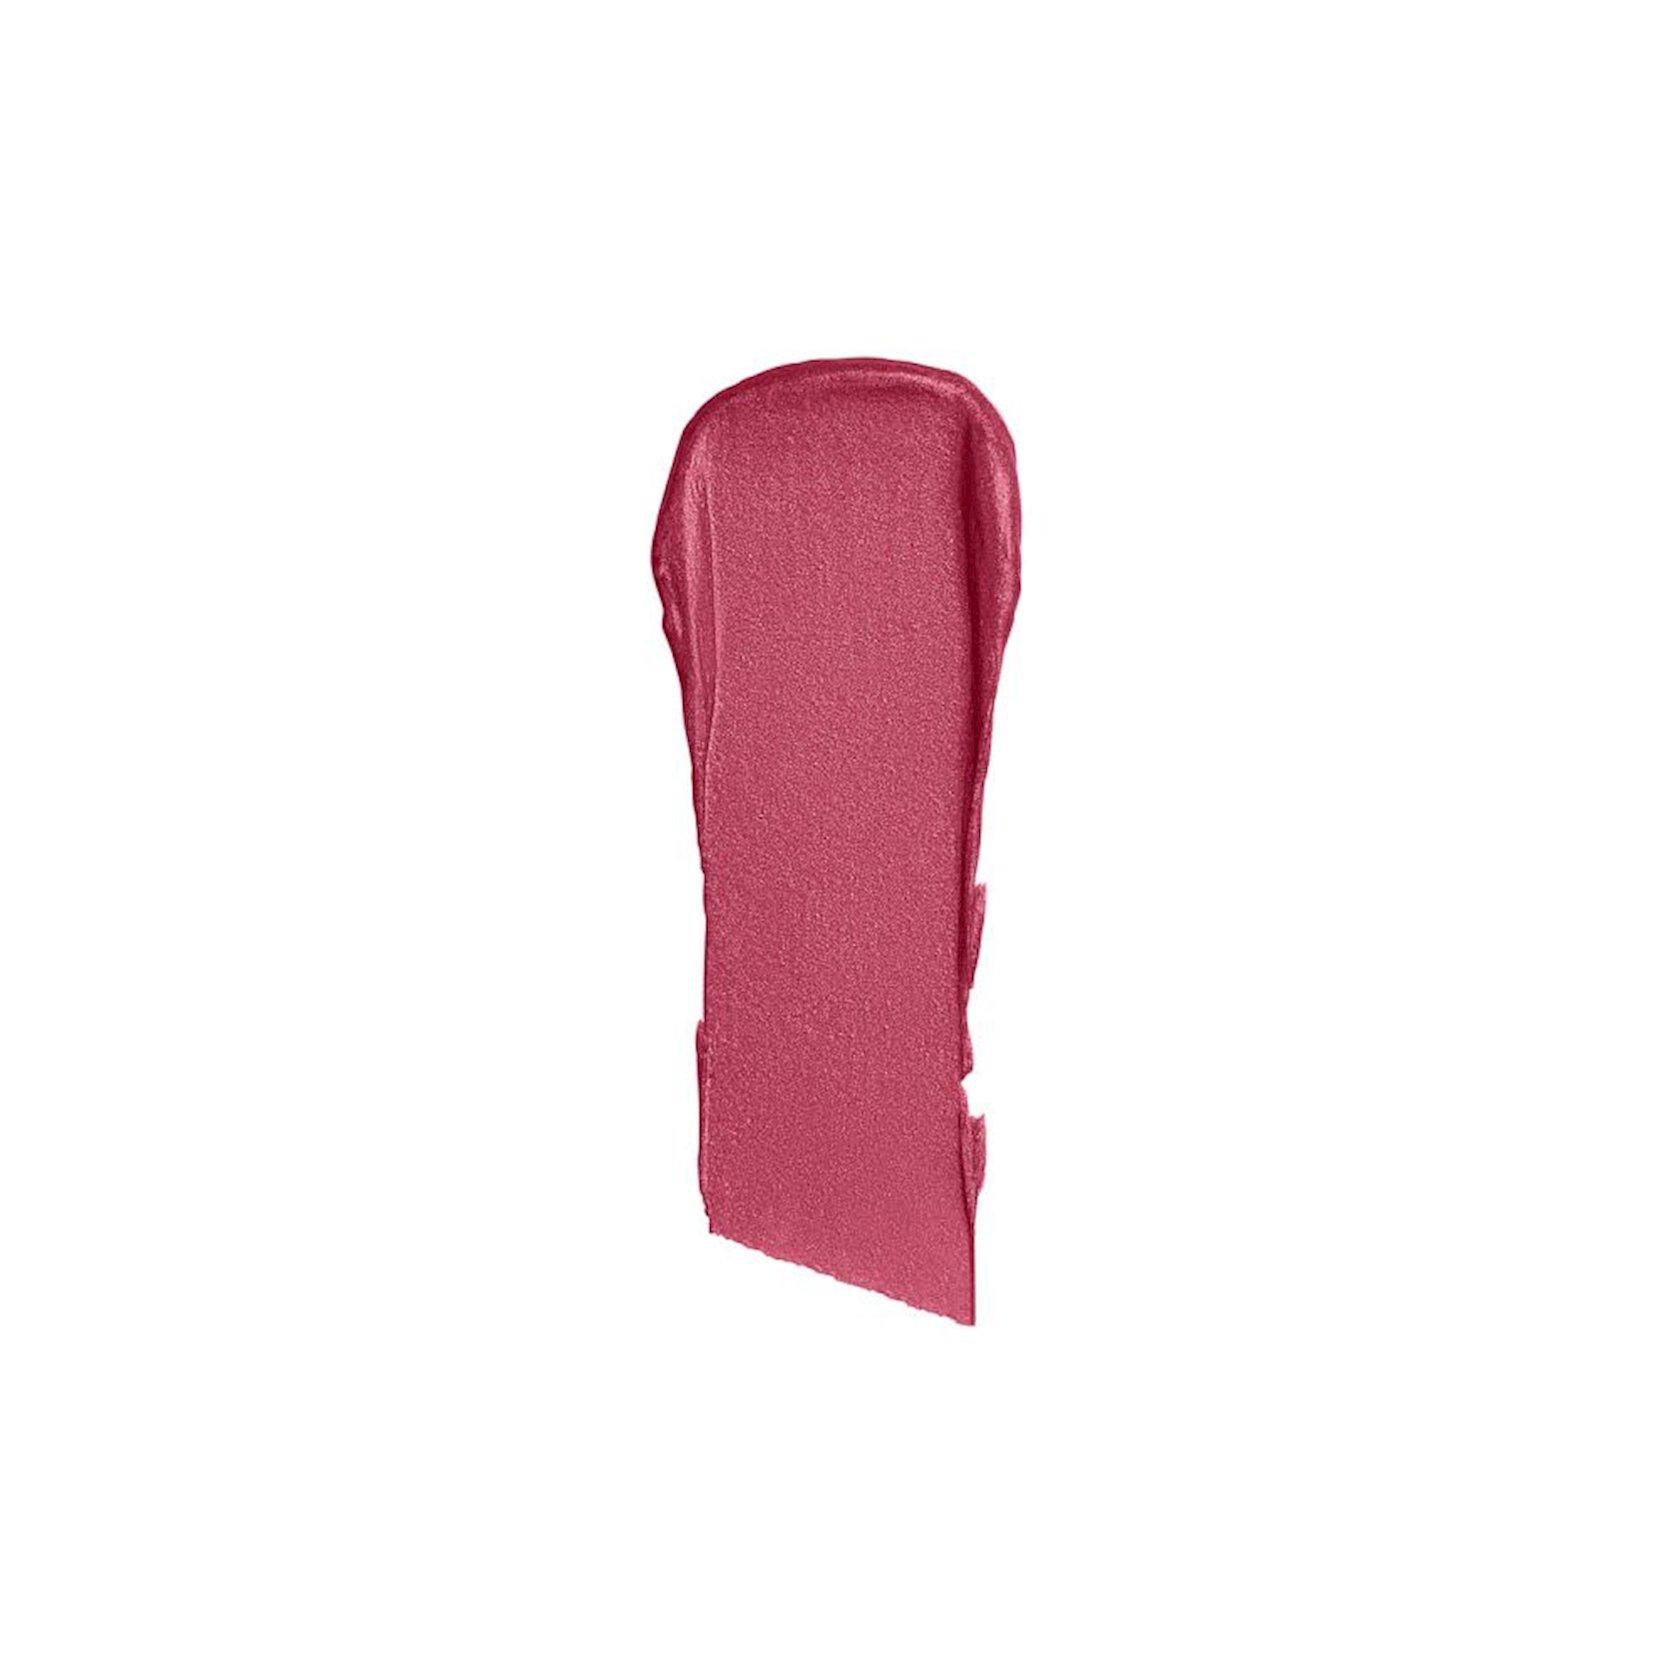 Dodaq pomadası Max Factor Colour Elixir Lipstick 110 Rich Raspberry 4.8 q